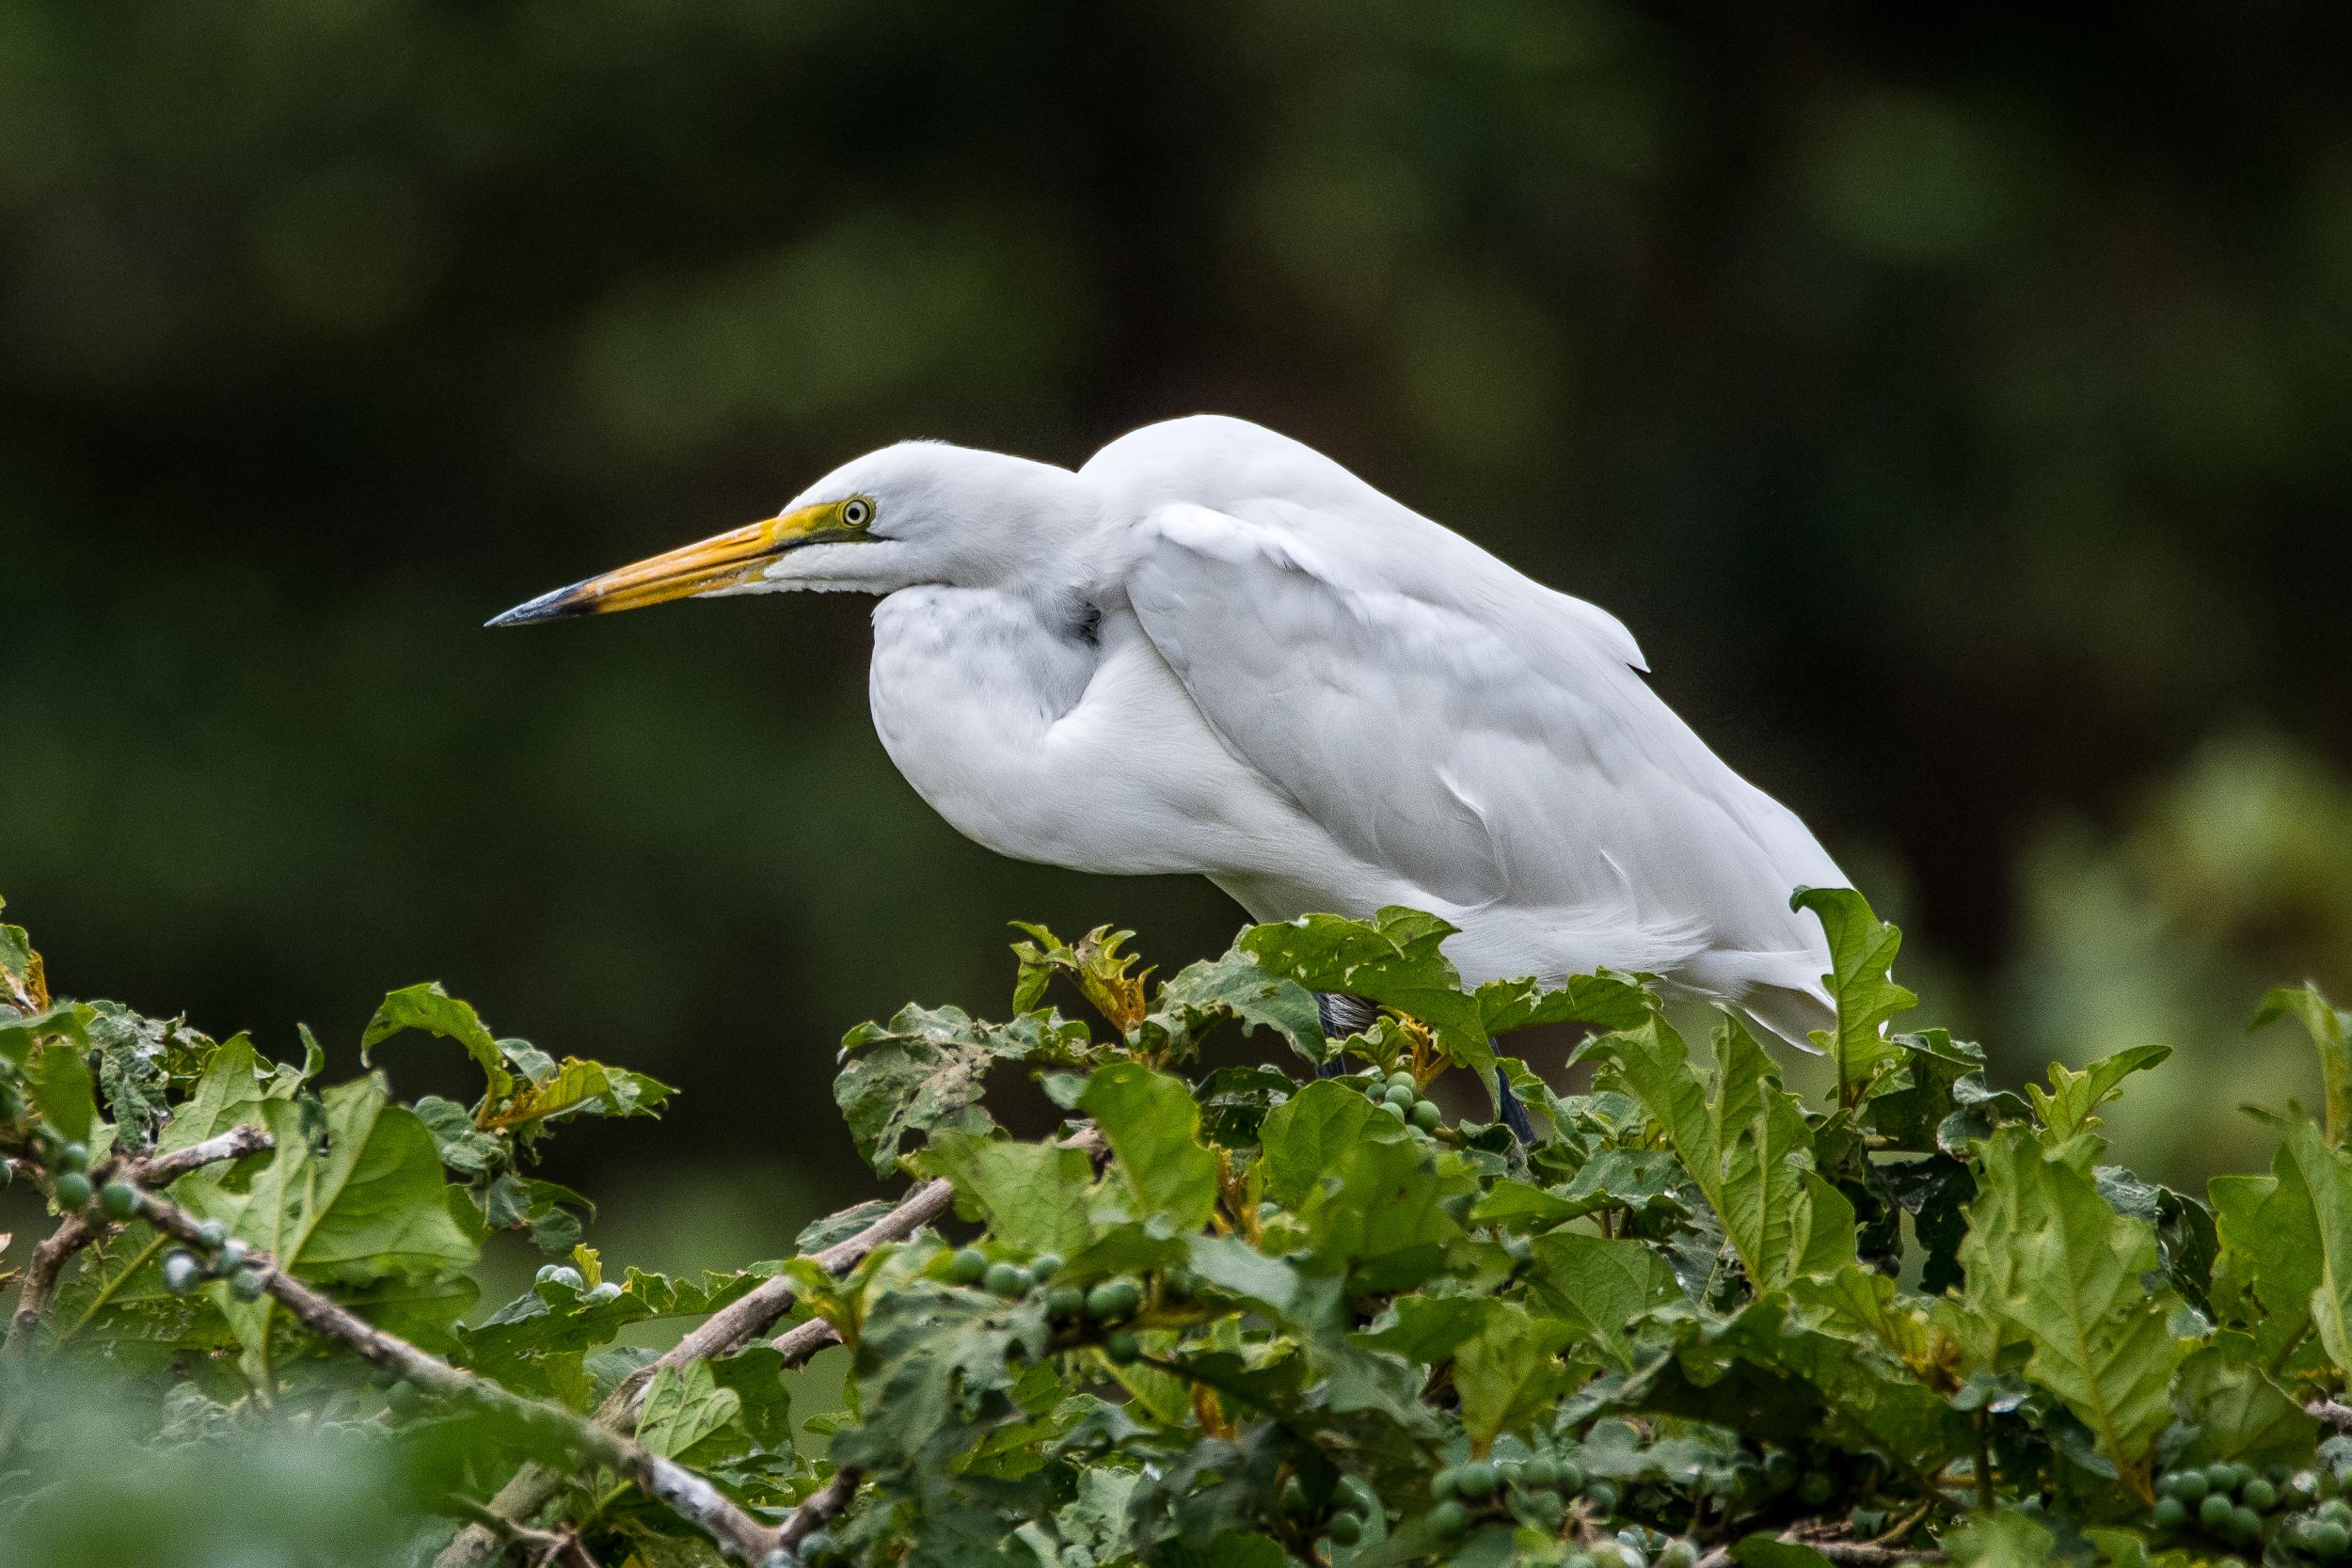 White Heron / Great Egret - Kalimba Reptile Park, Lusaka, Zambia